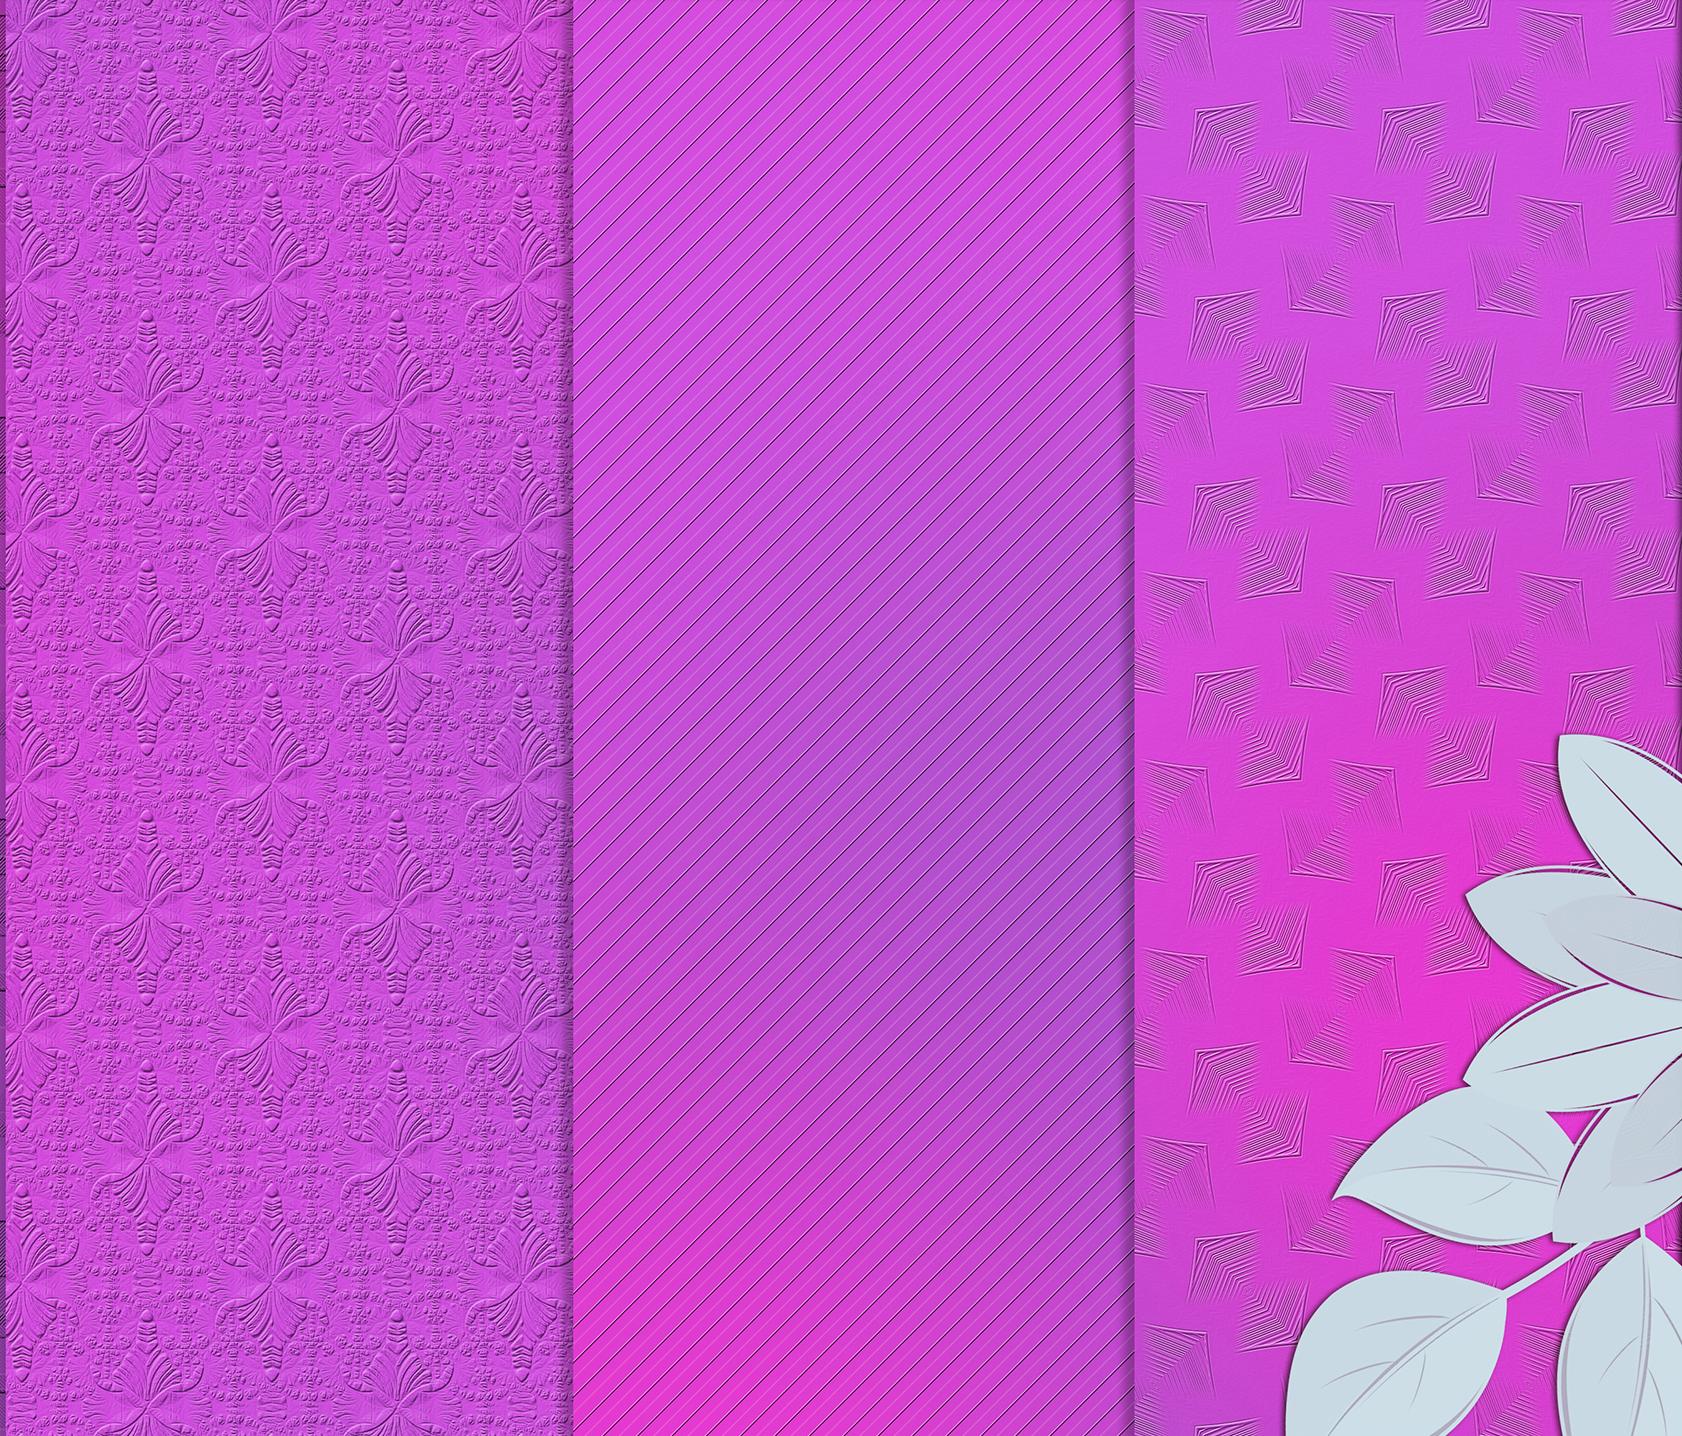 Purple-blue abstract textures, Digital Scrapbook Paper example image 2